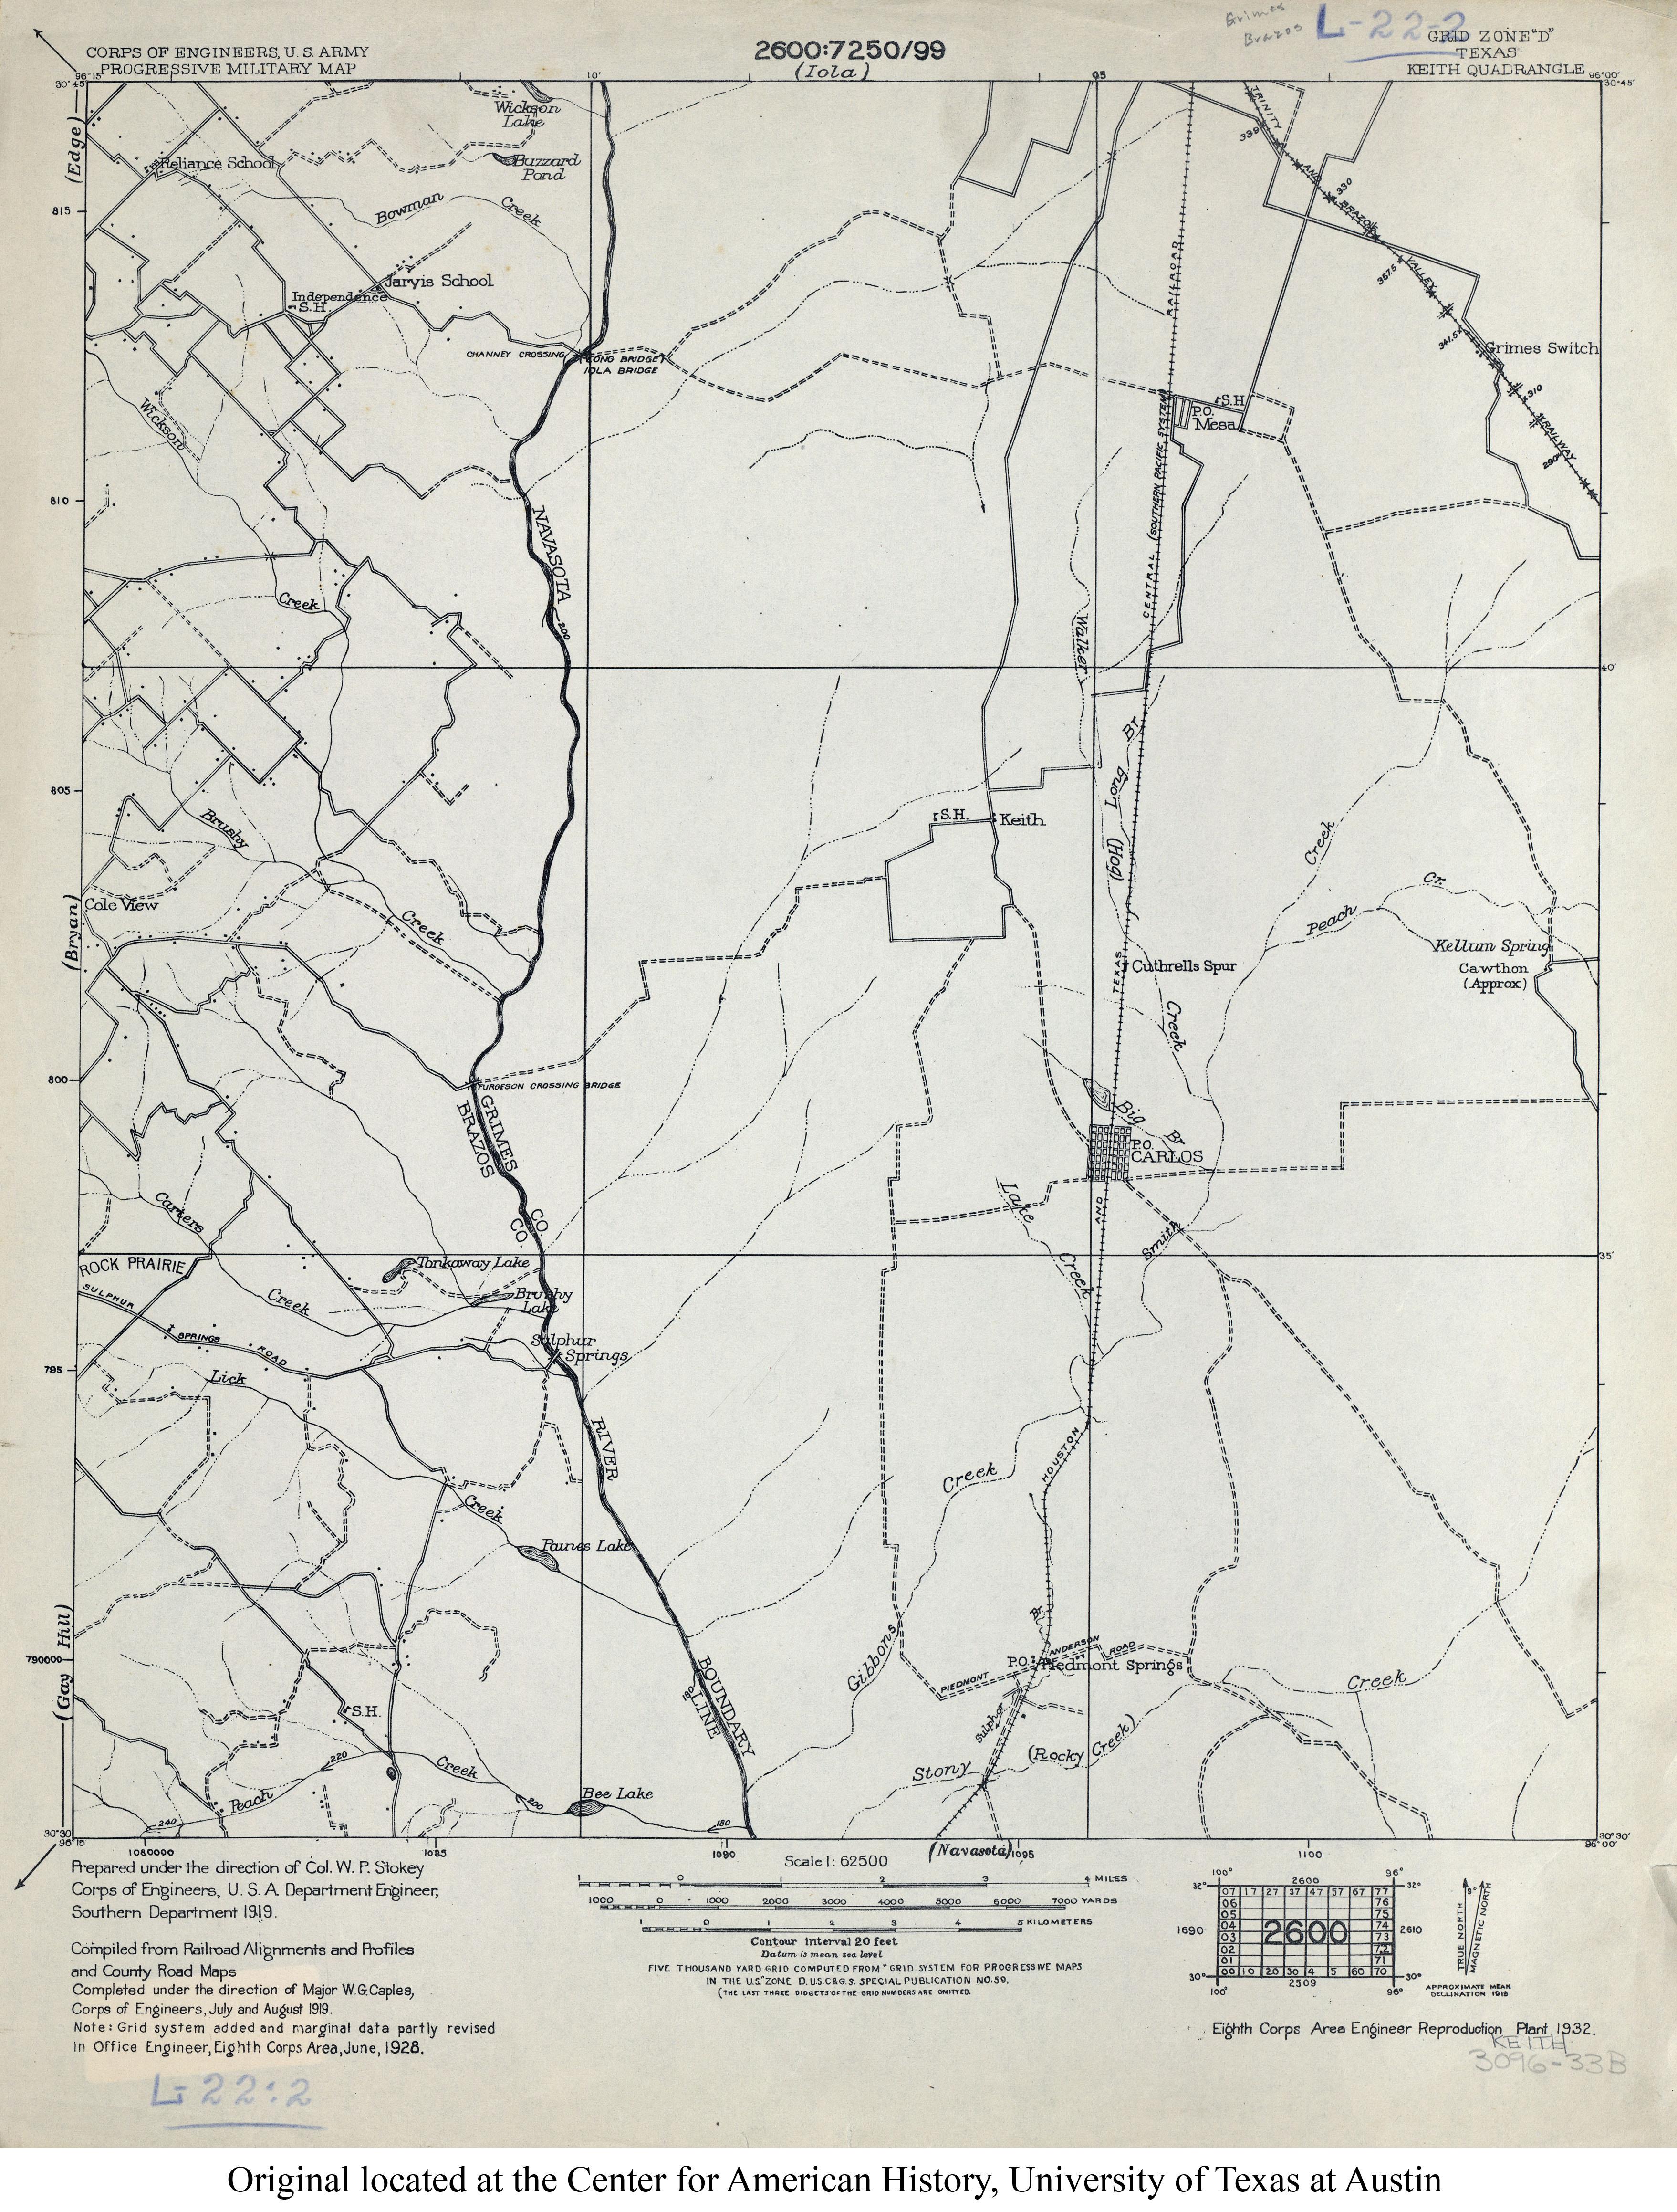 1928 2 7mb U S Army Corps Of Engineers Progressive Military Map